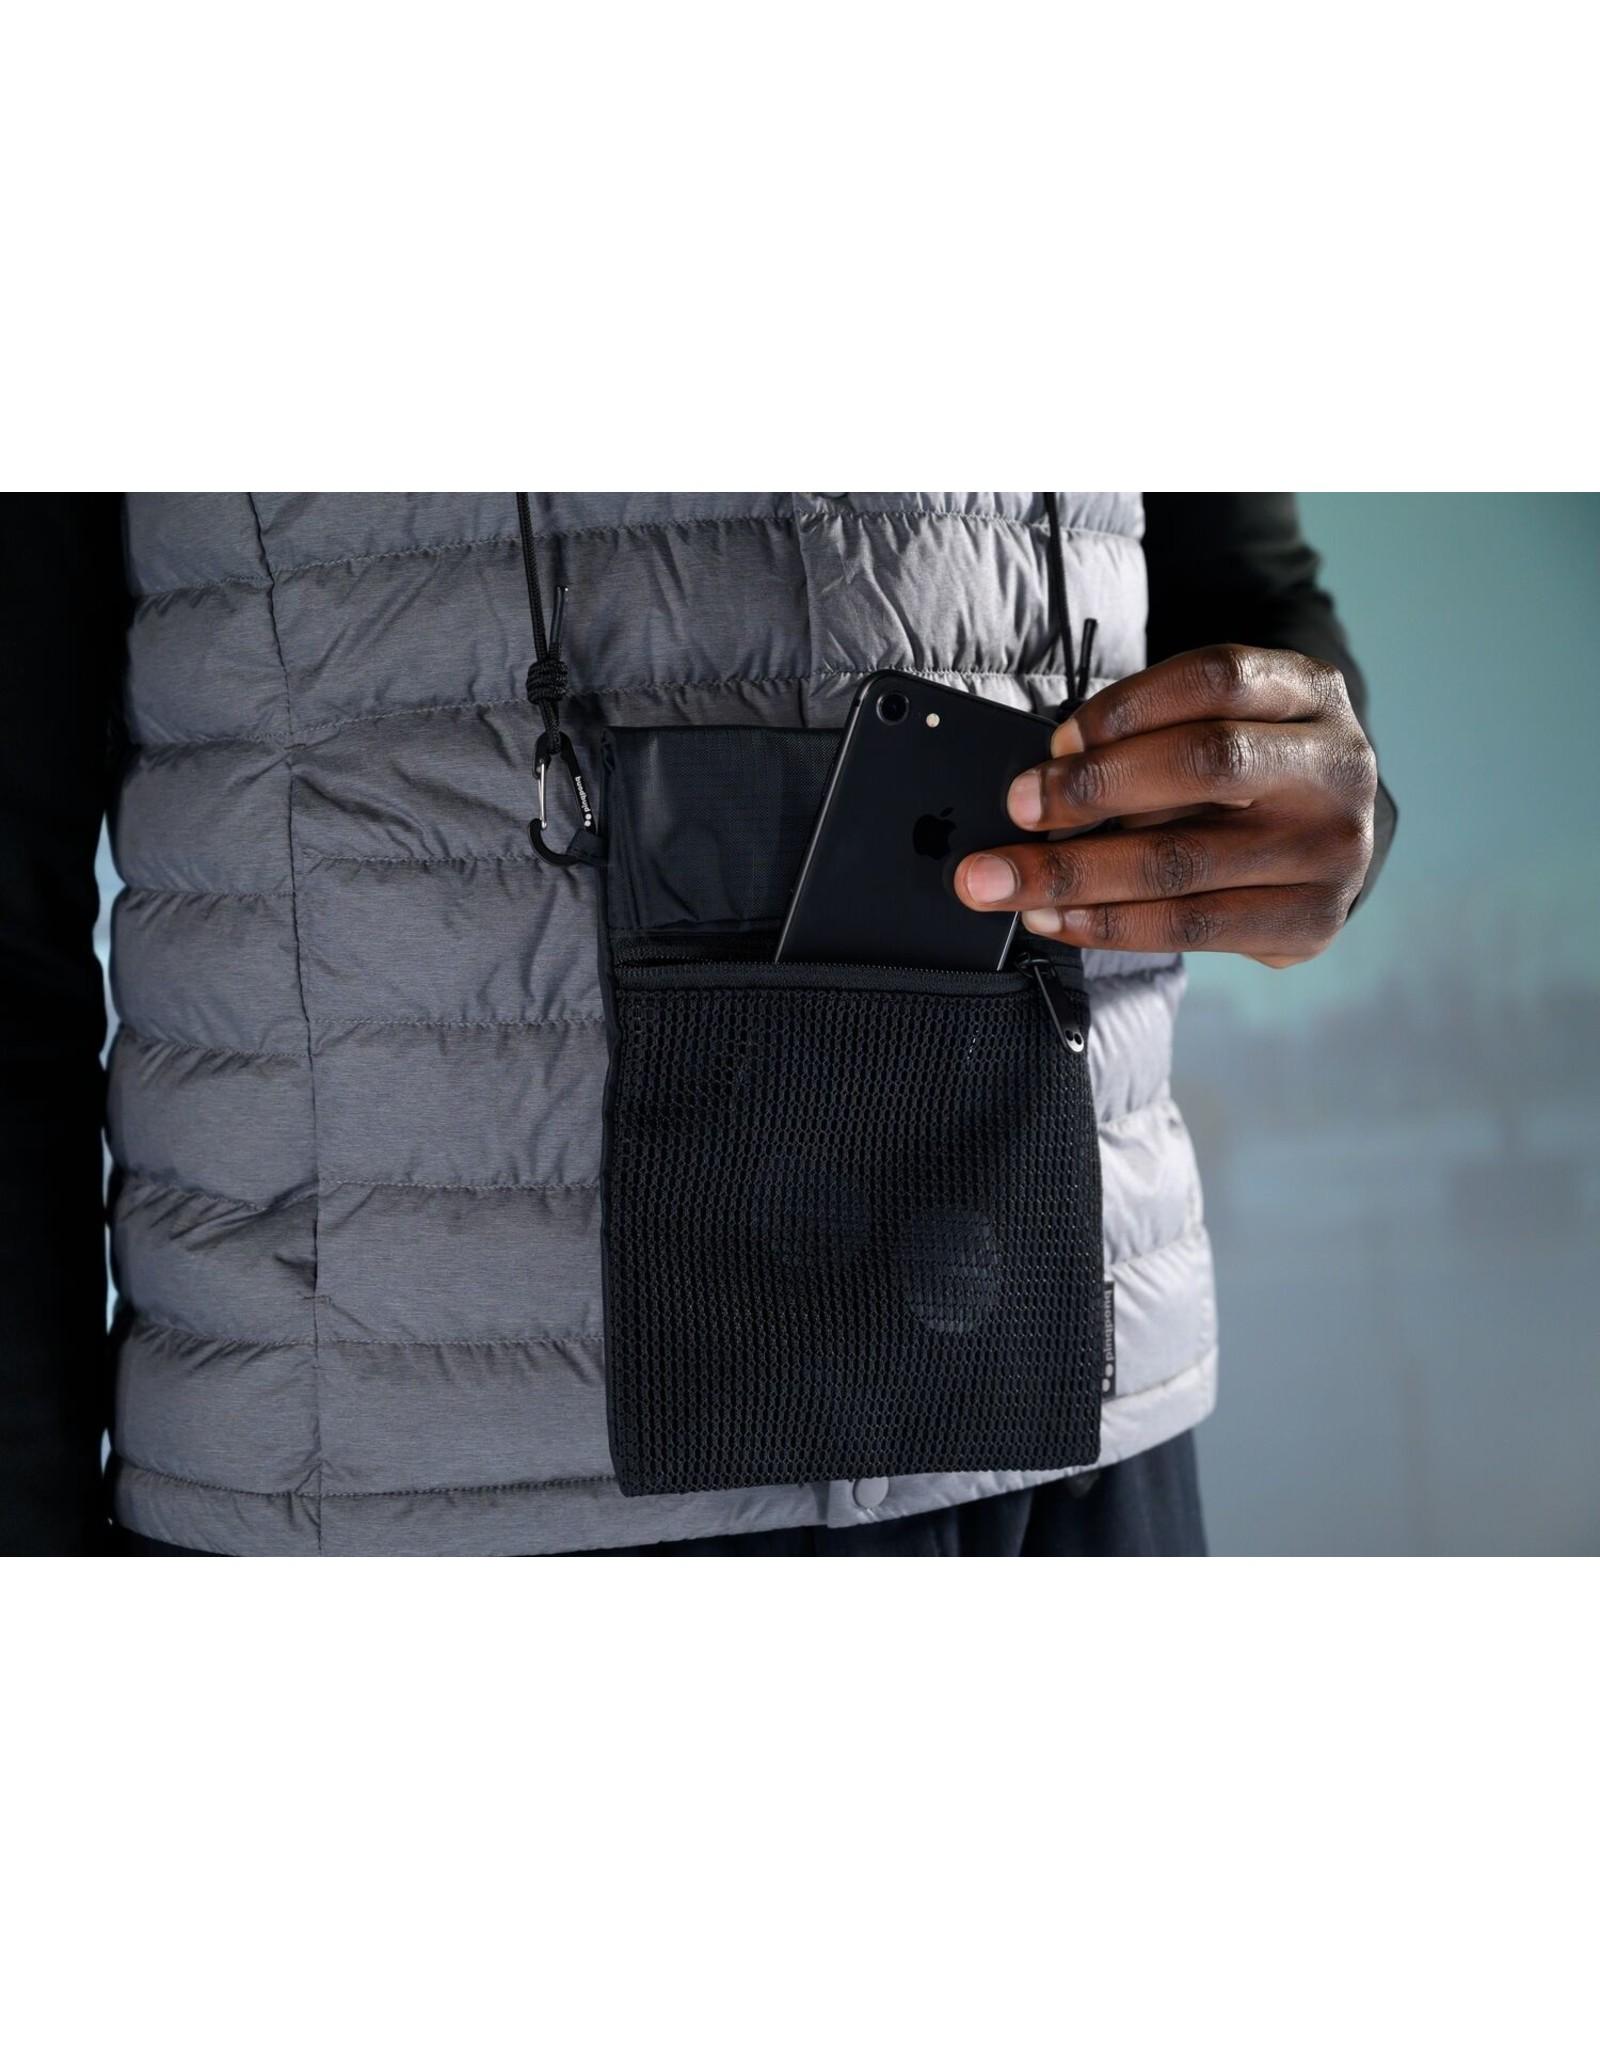 pinqponq FLAK medium neck pouch